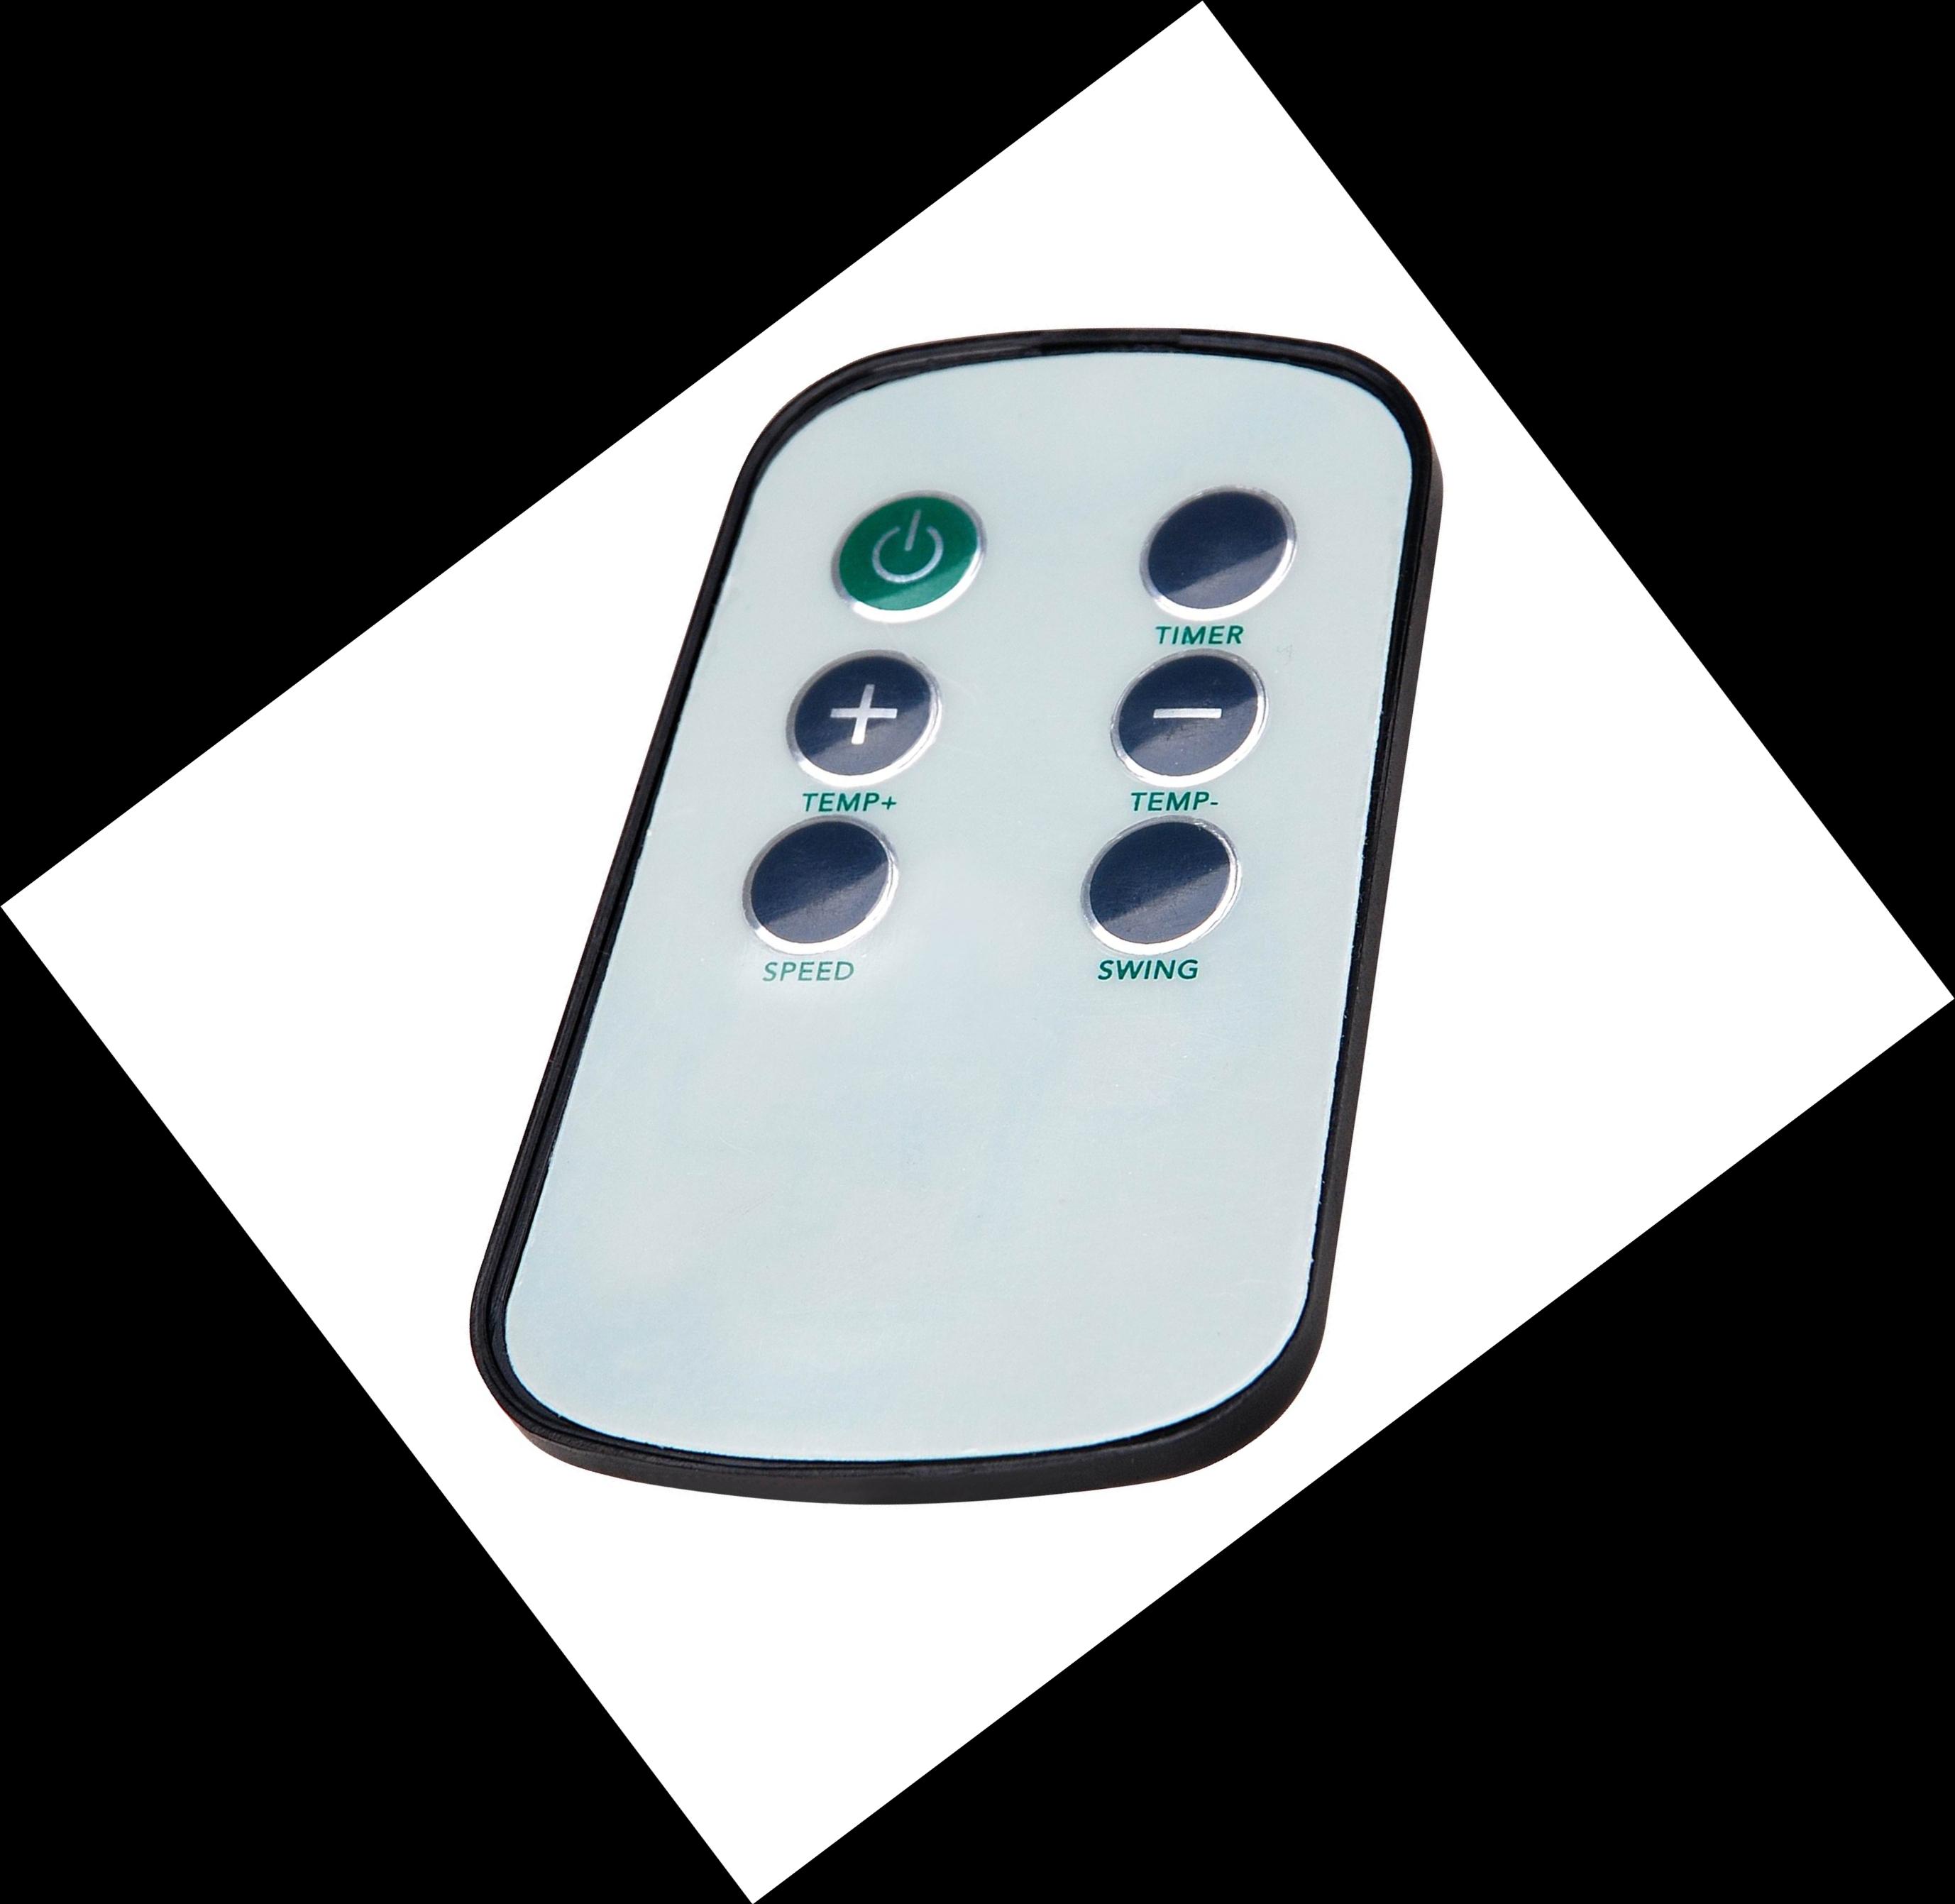 Portable Air Conditioner 14000btu Koolbreeze Climateasy14 (4.1Kw) #03594D